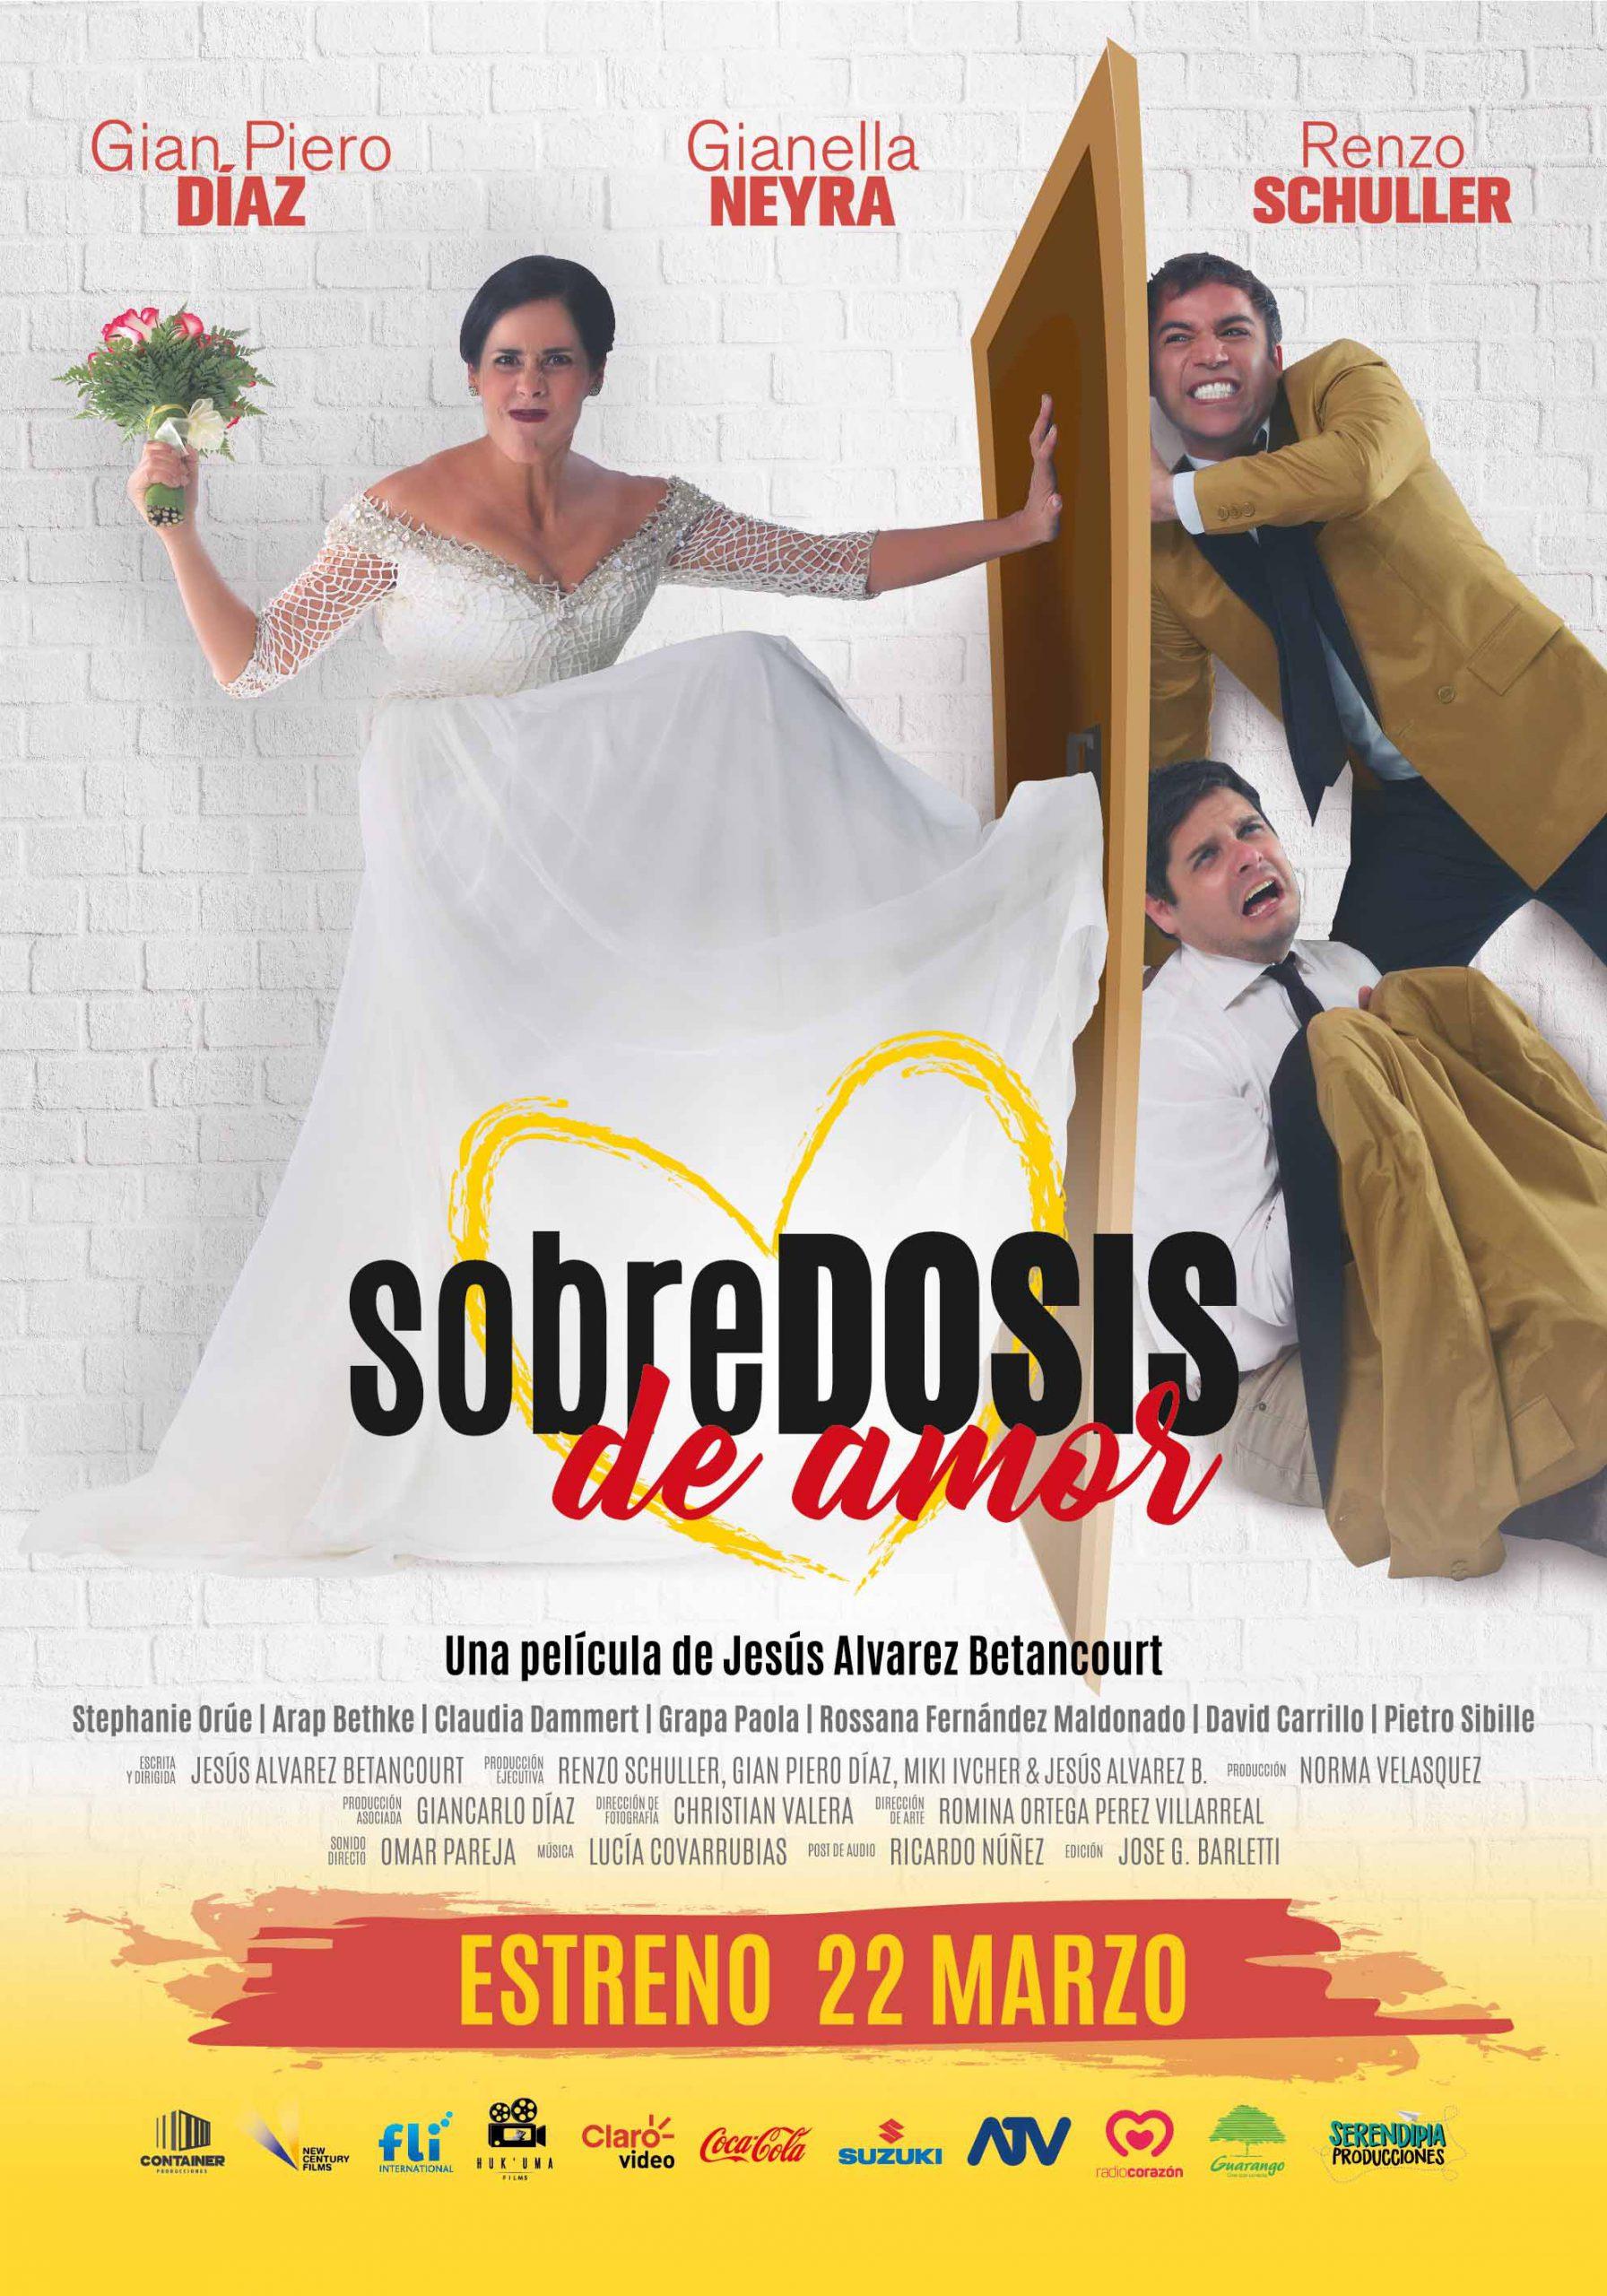 AFICHE SOBREDOSIS FINAL 2.2